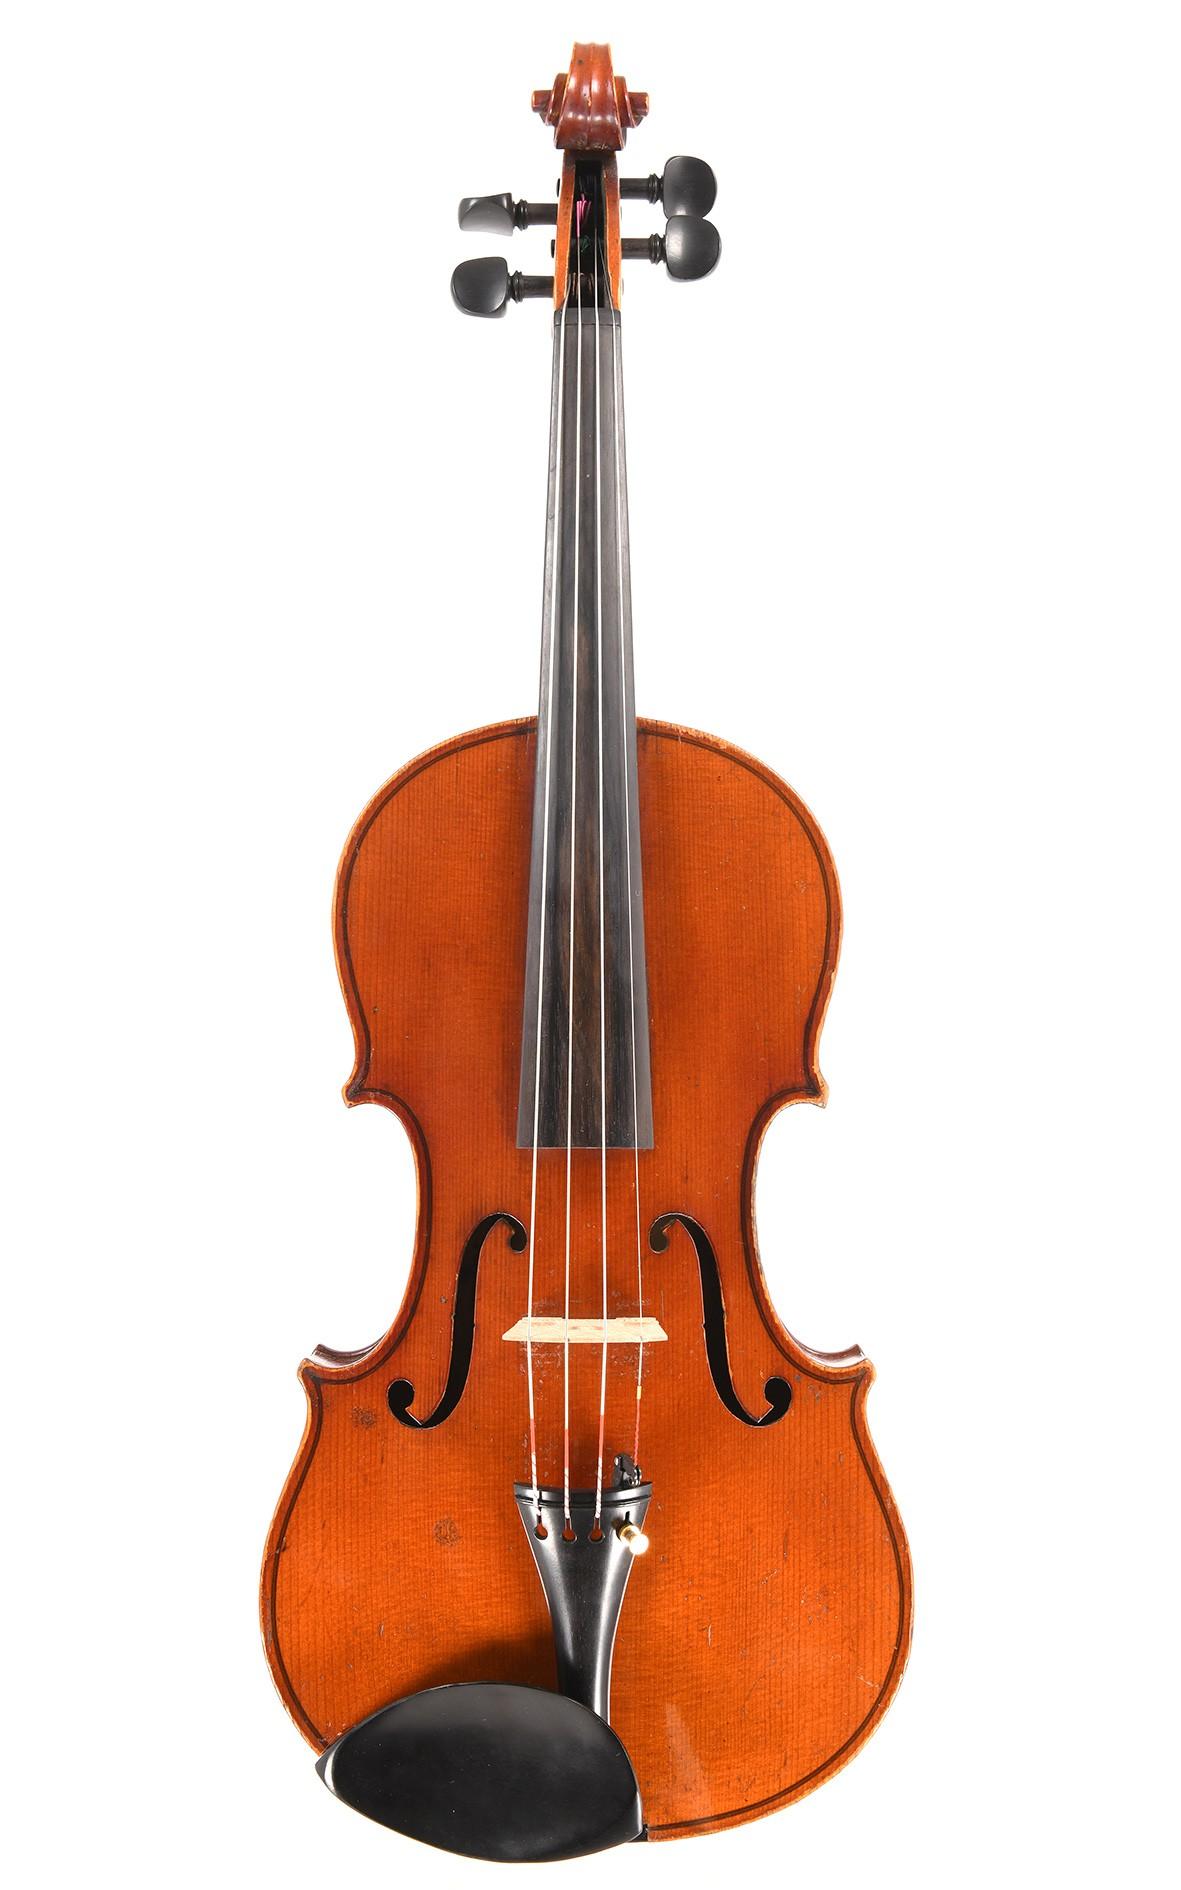 German violin from Markneukirchen, Saxony